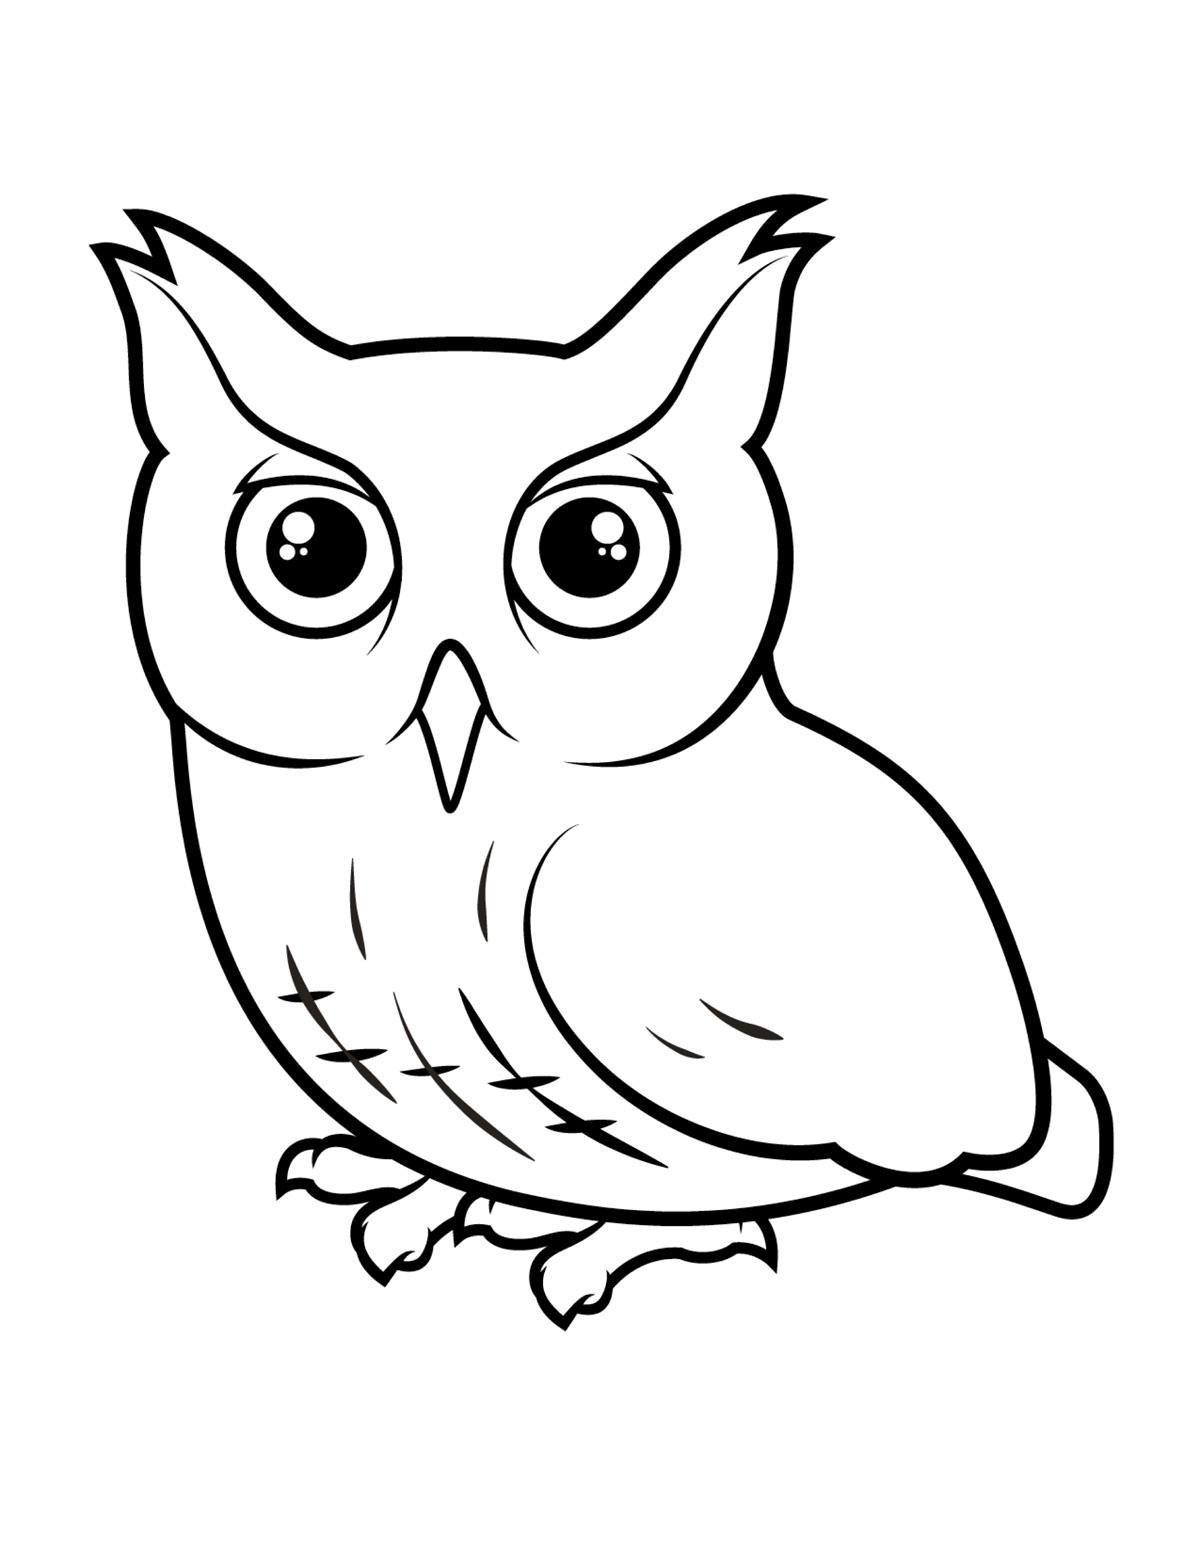 Раскраска птицы для малышей